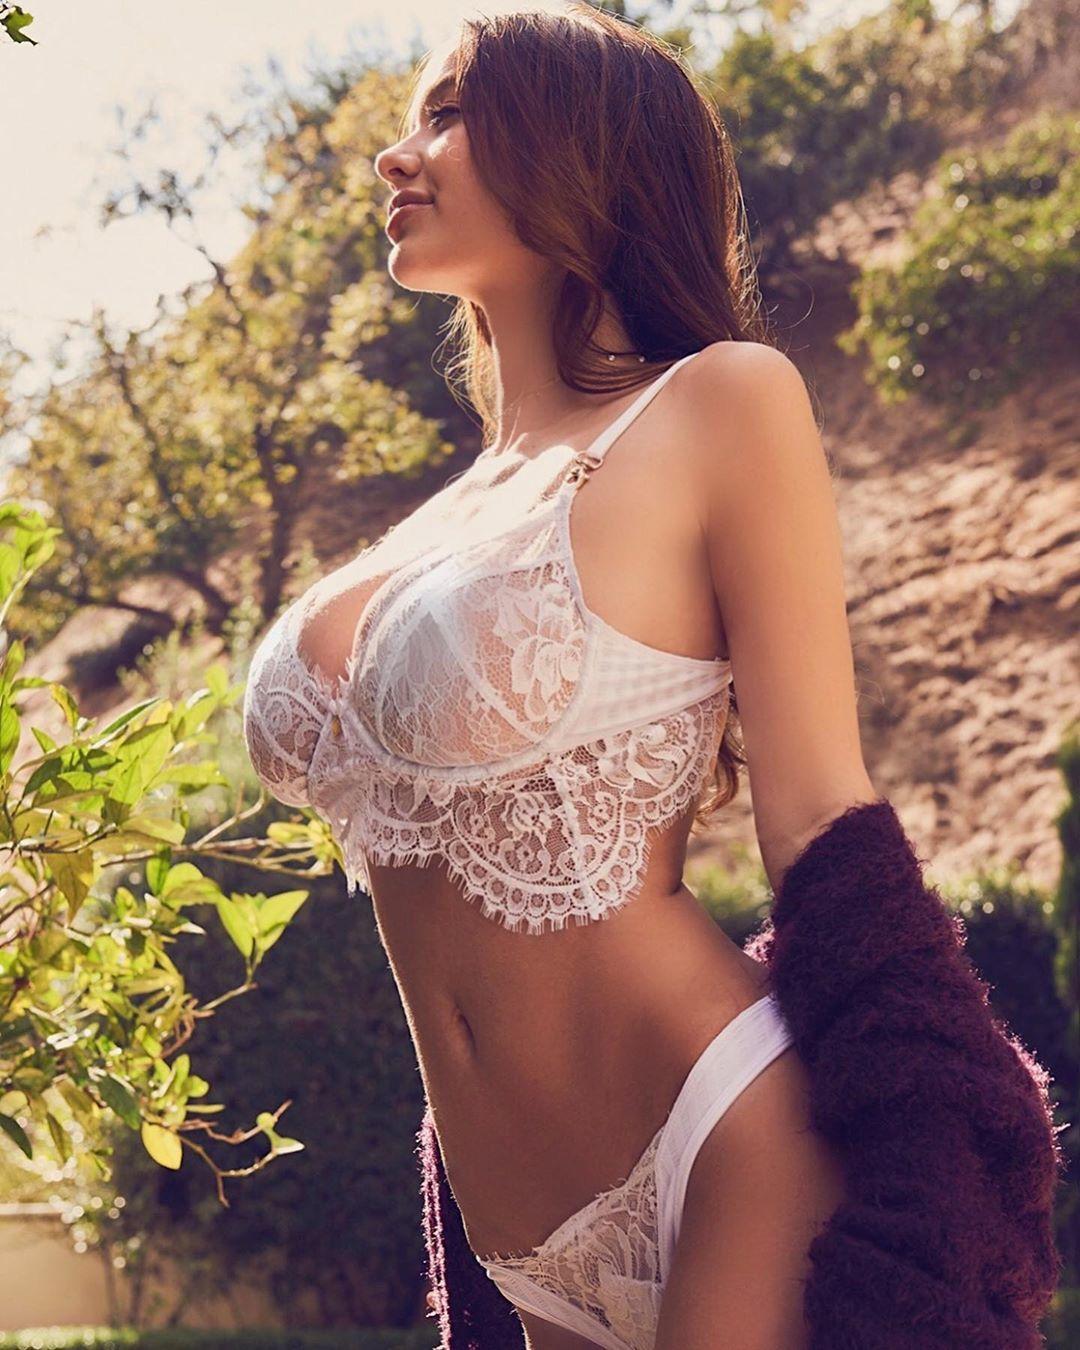 USA Model Beautiful Instagrammer Sophie Mudd048